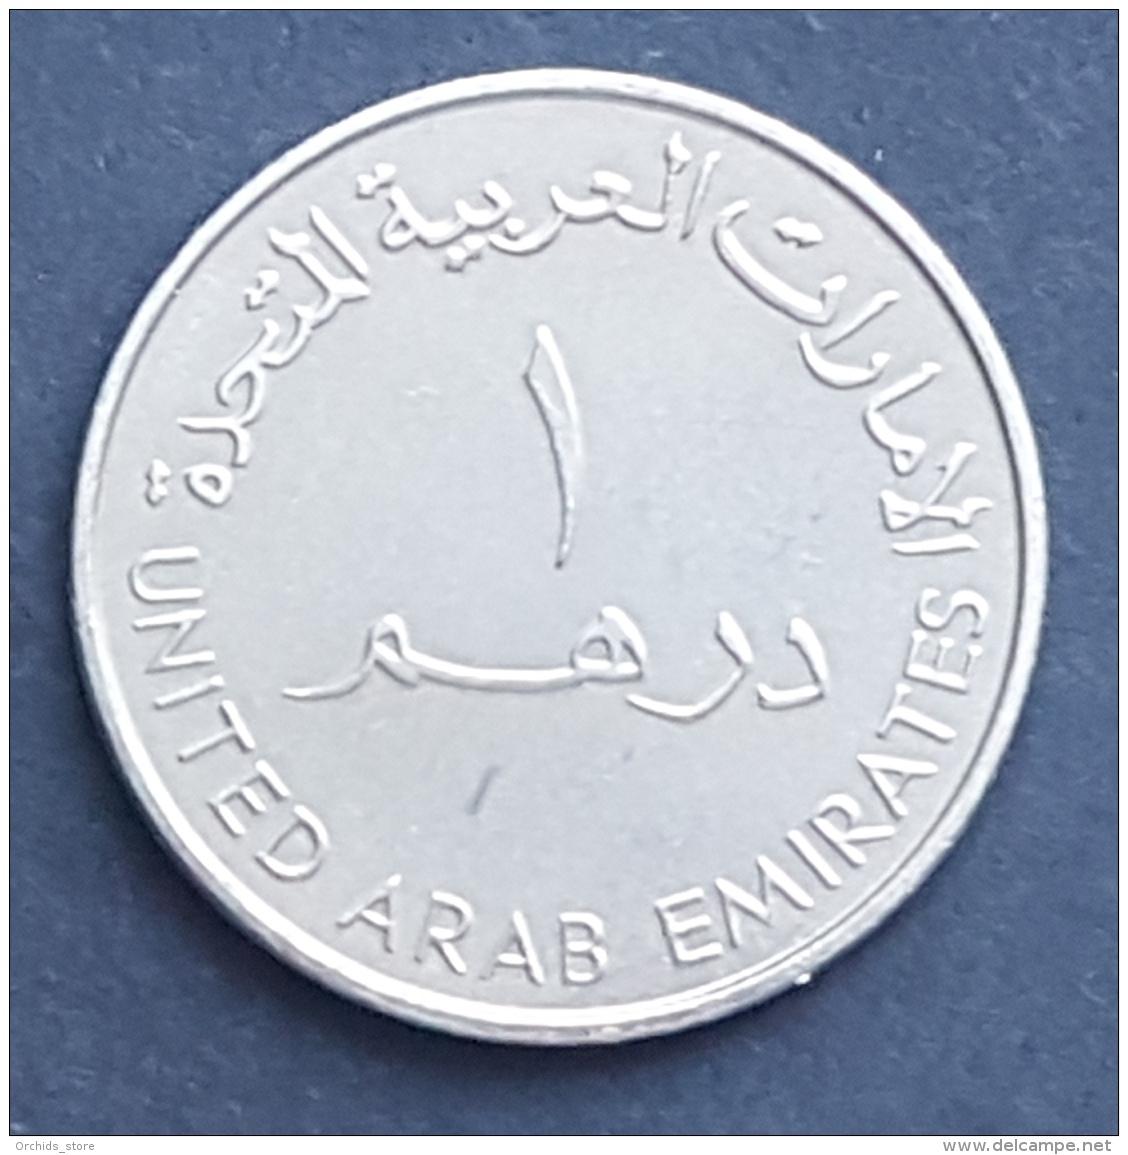 HX - UAE 2000 1 Dirham Coin UNC - 1975-2000 25 Years AL ISLAMI - Dubai Islamic Bank - Emirats Arabes Unis